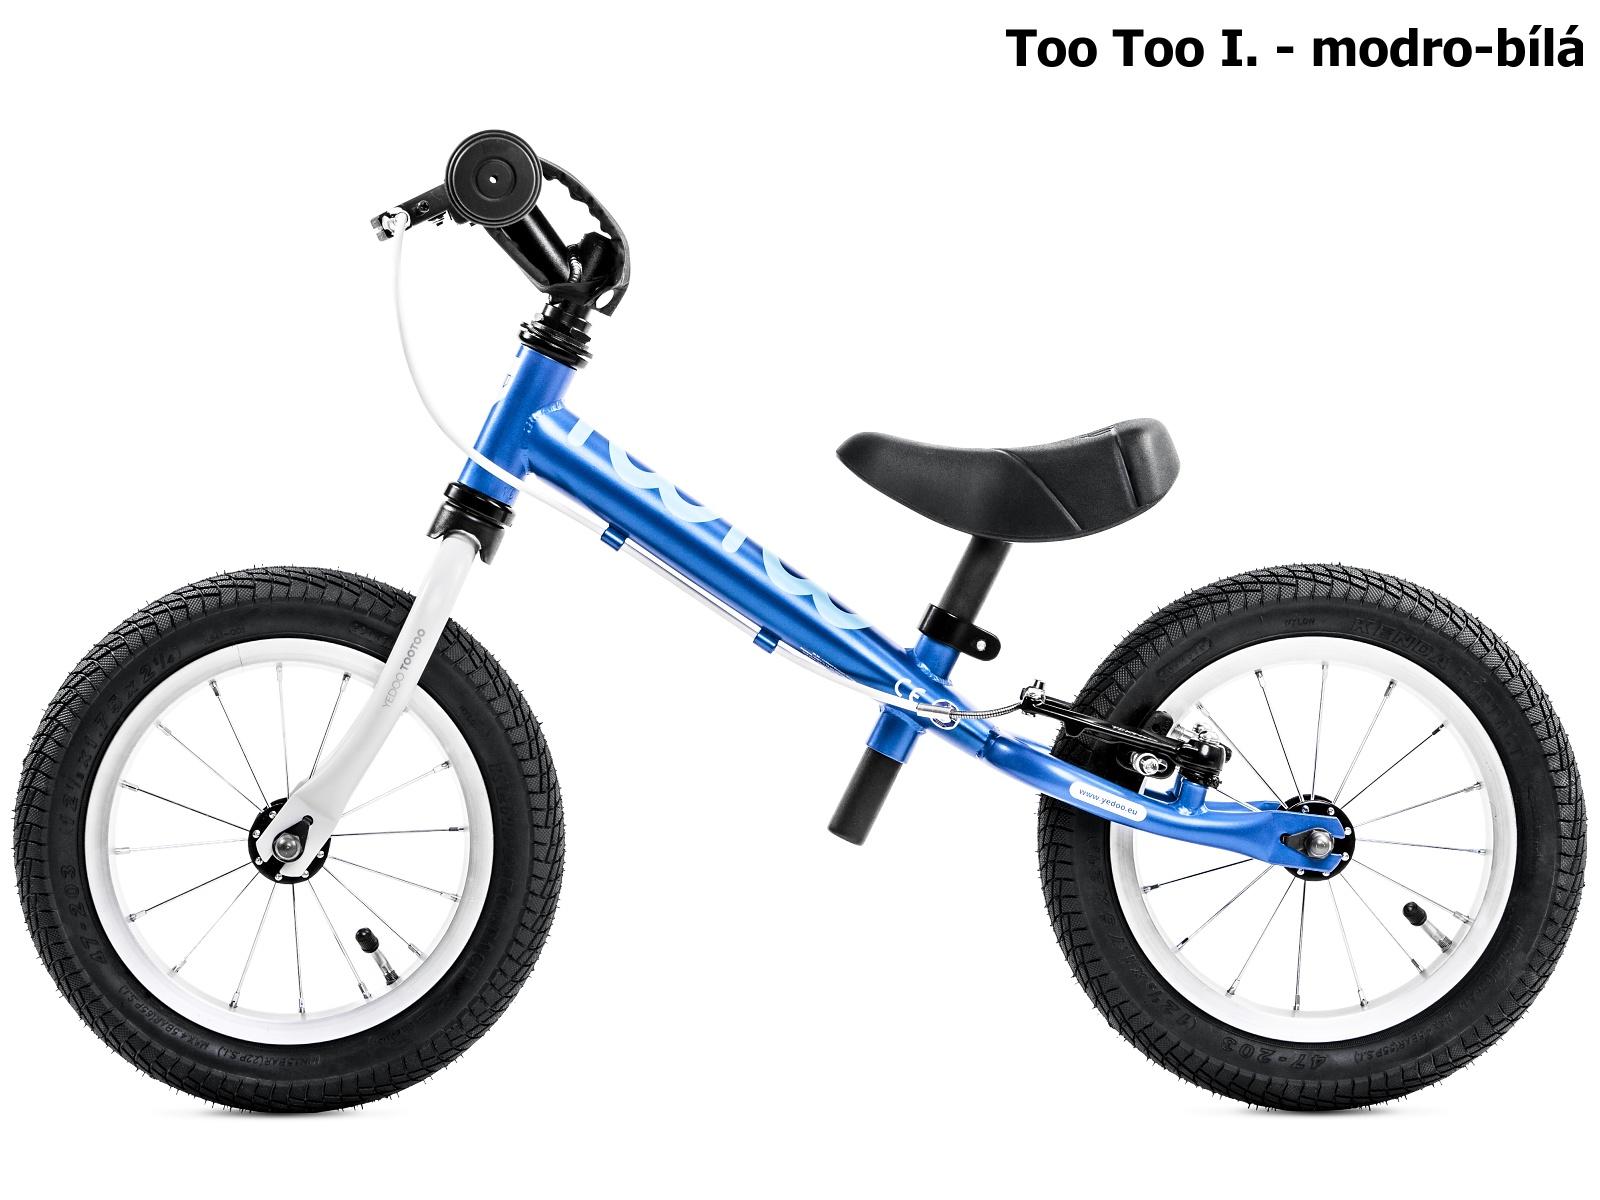 Dětské odrážedlo YEDOO Too Too I. - modro-bílé